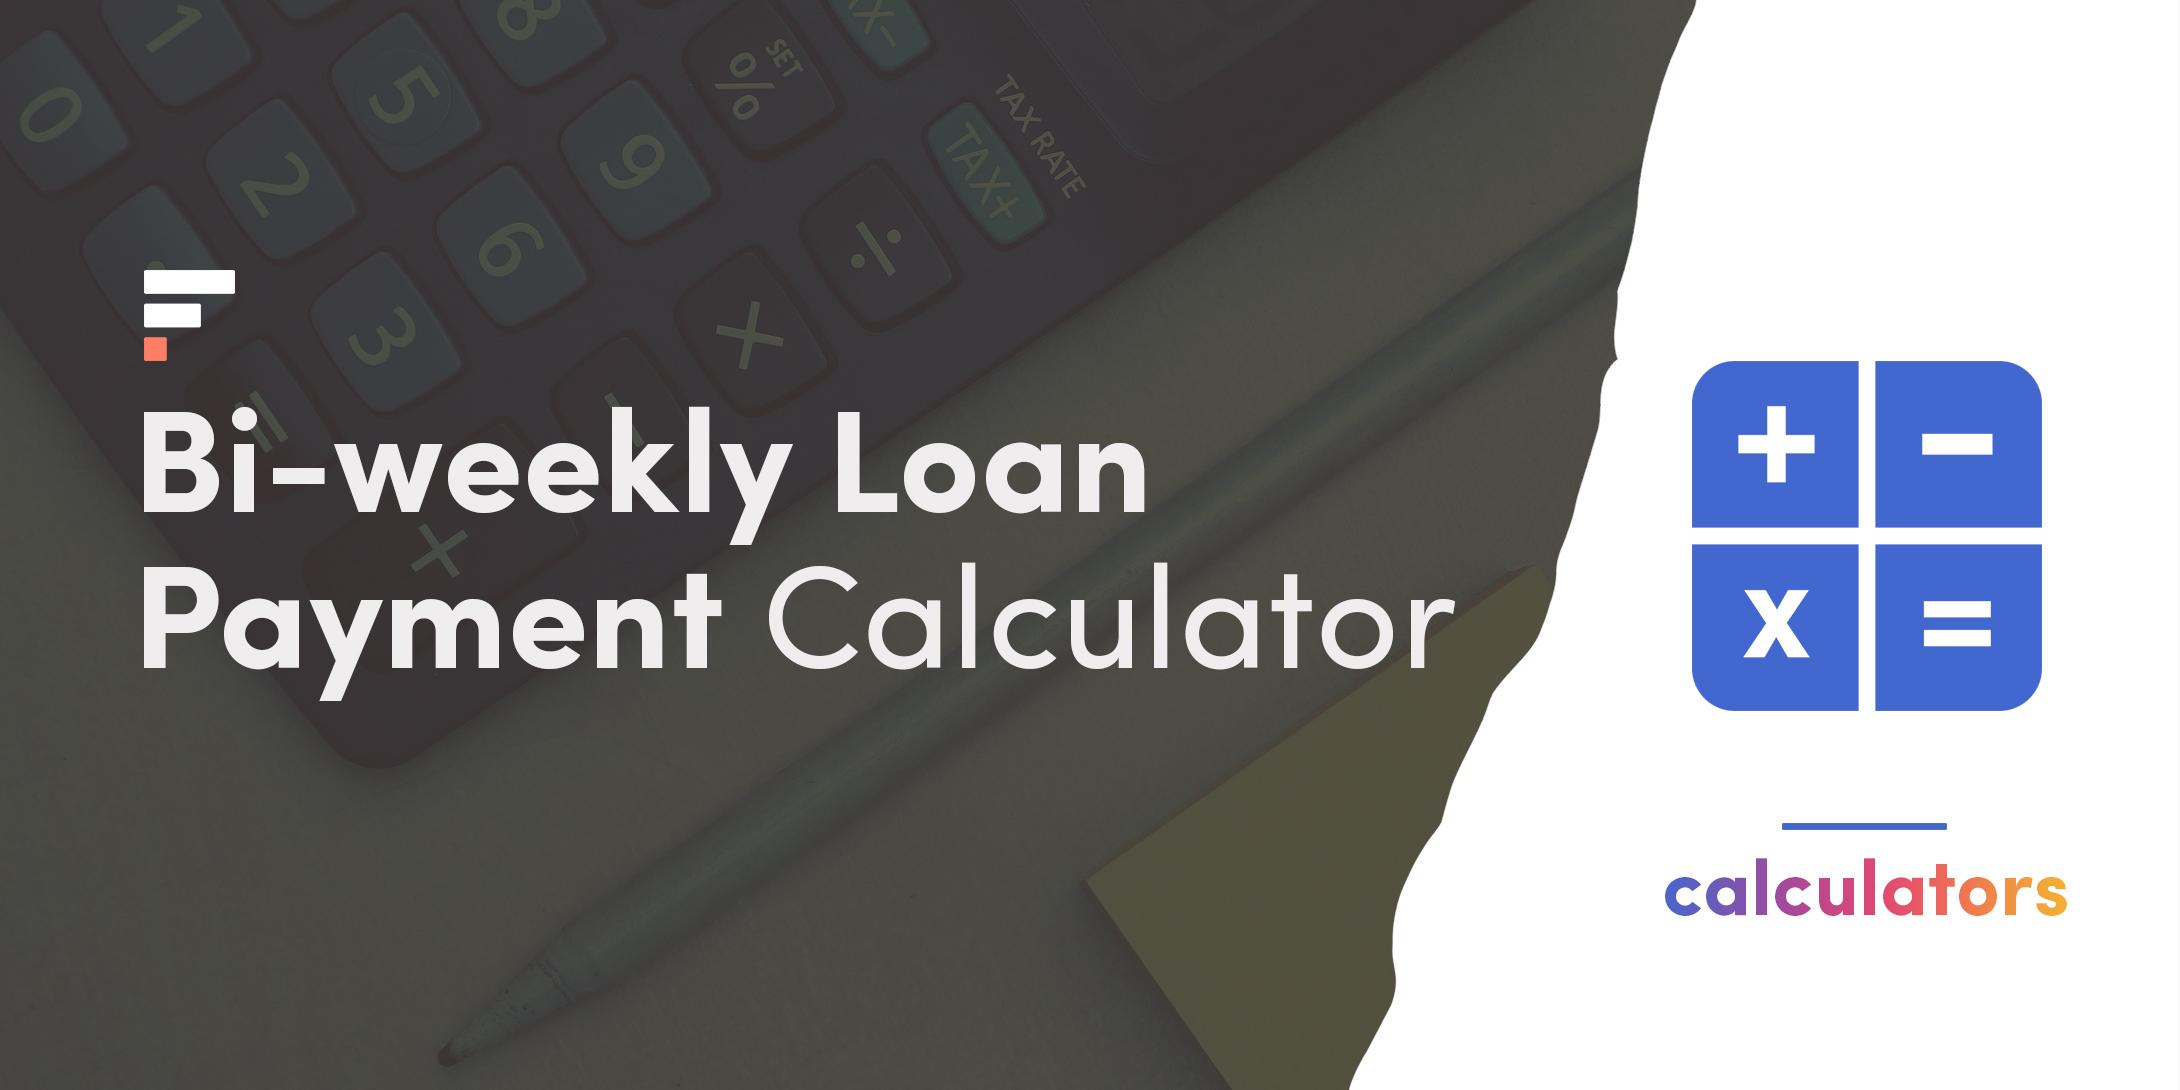 Bi-weekly loan payment calculator